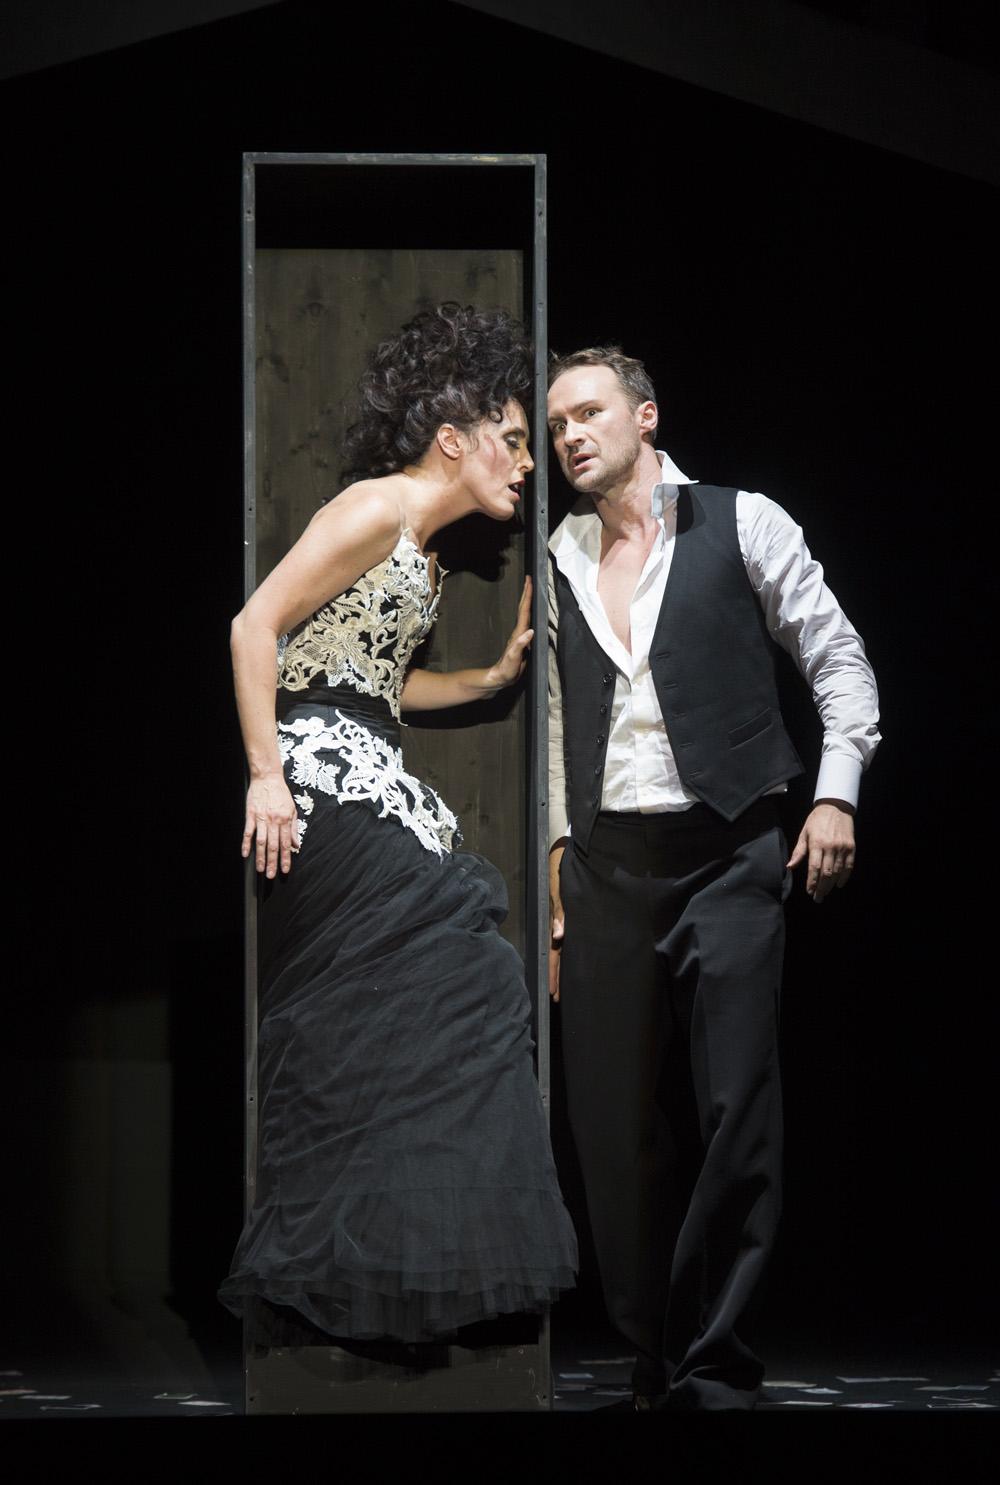 Tales of Hoffmann opens at Komische Oper Berlin